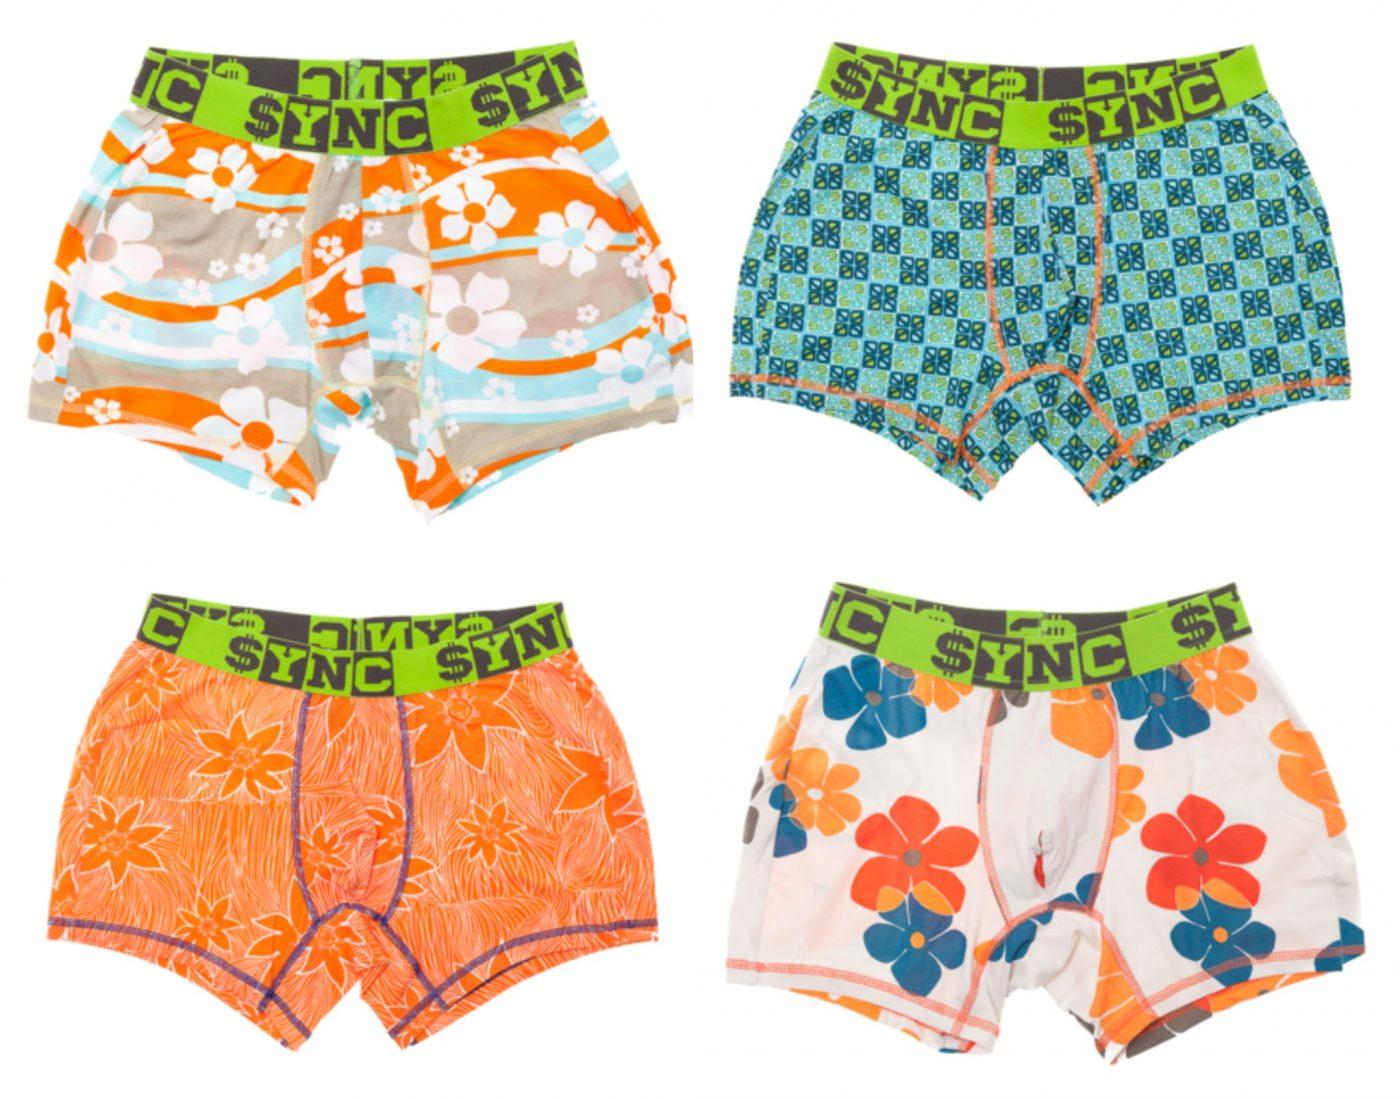 SYNC Underwear